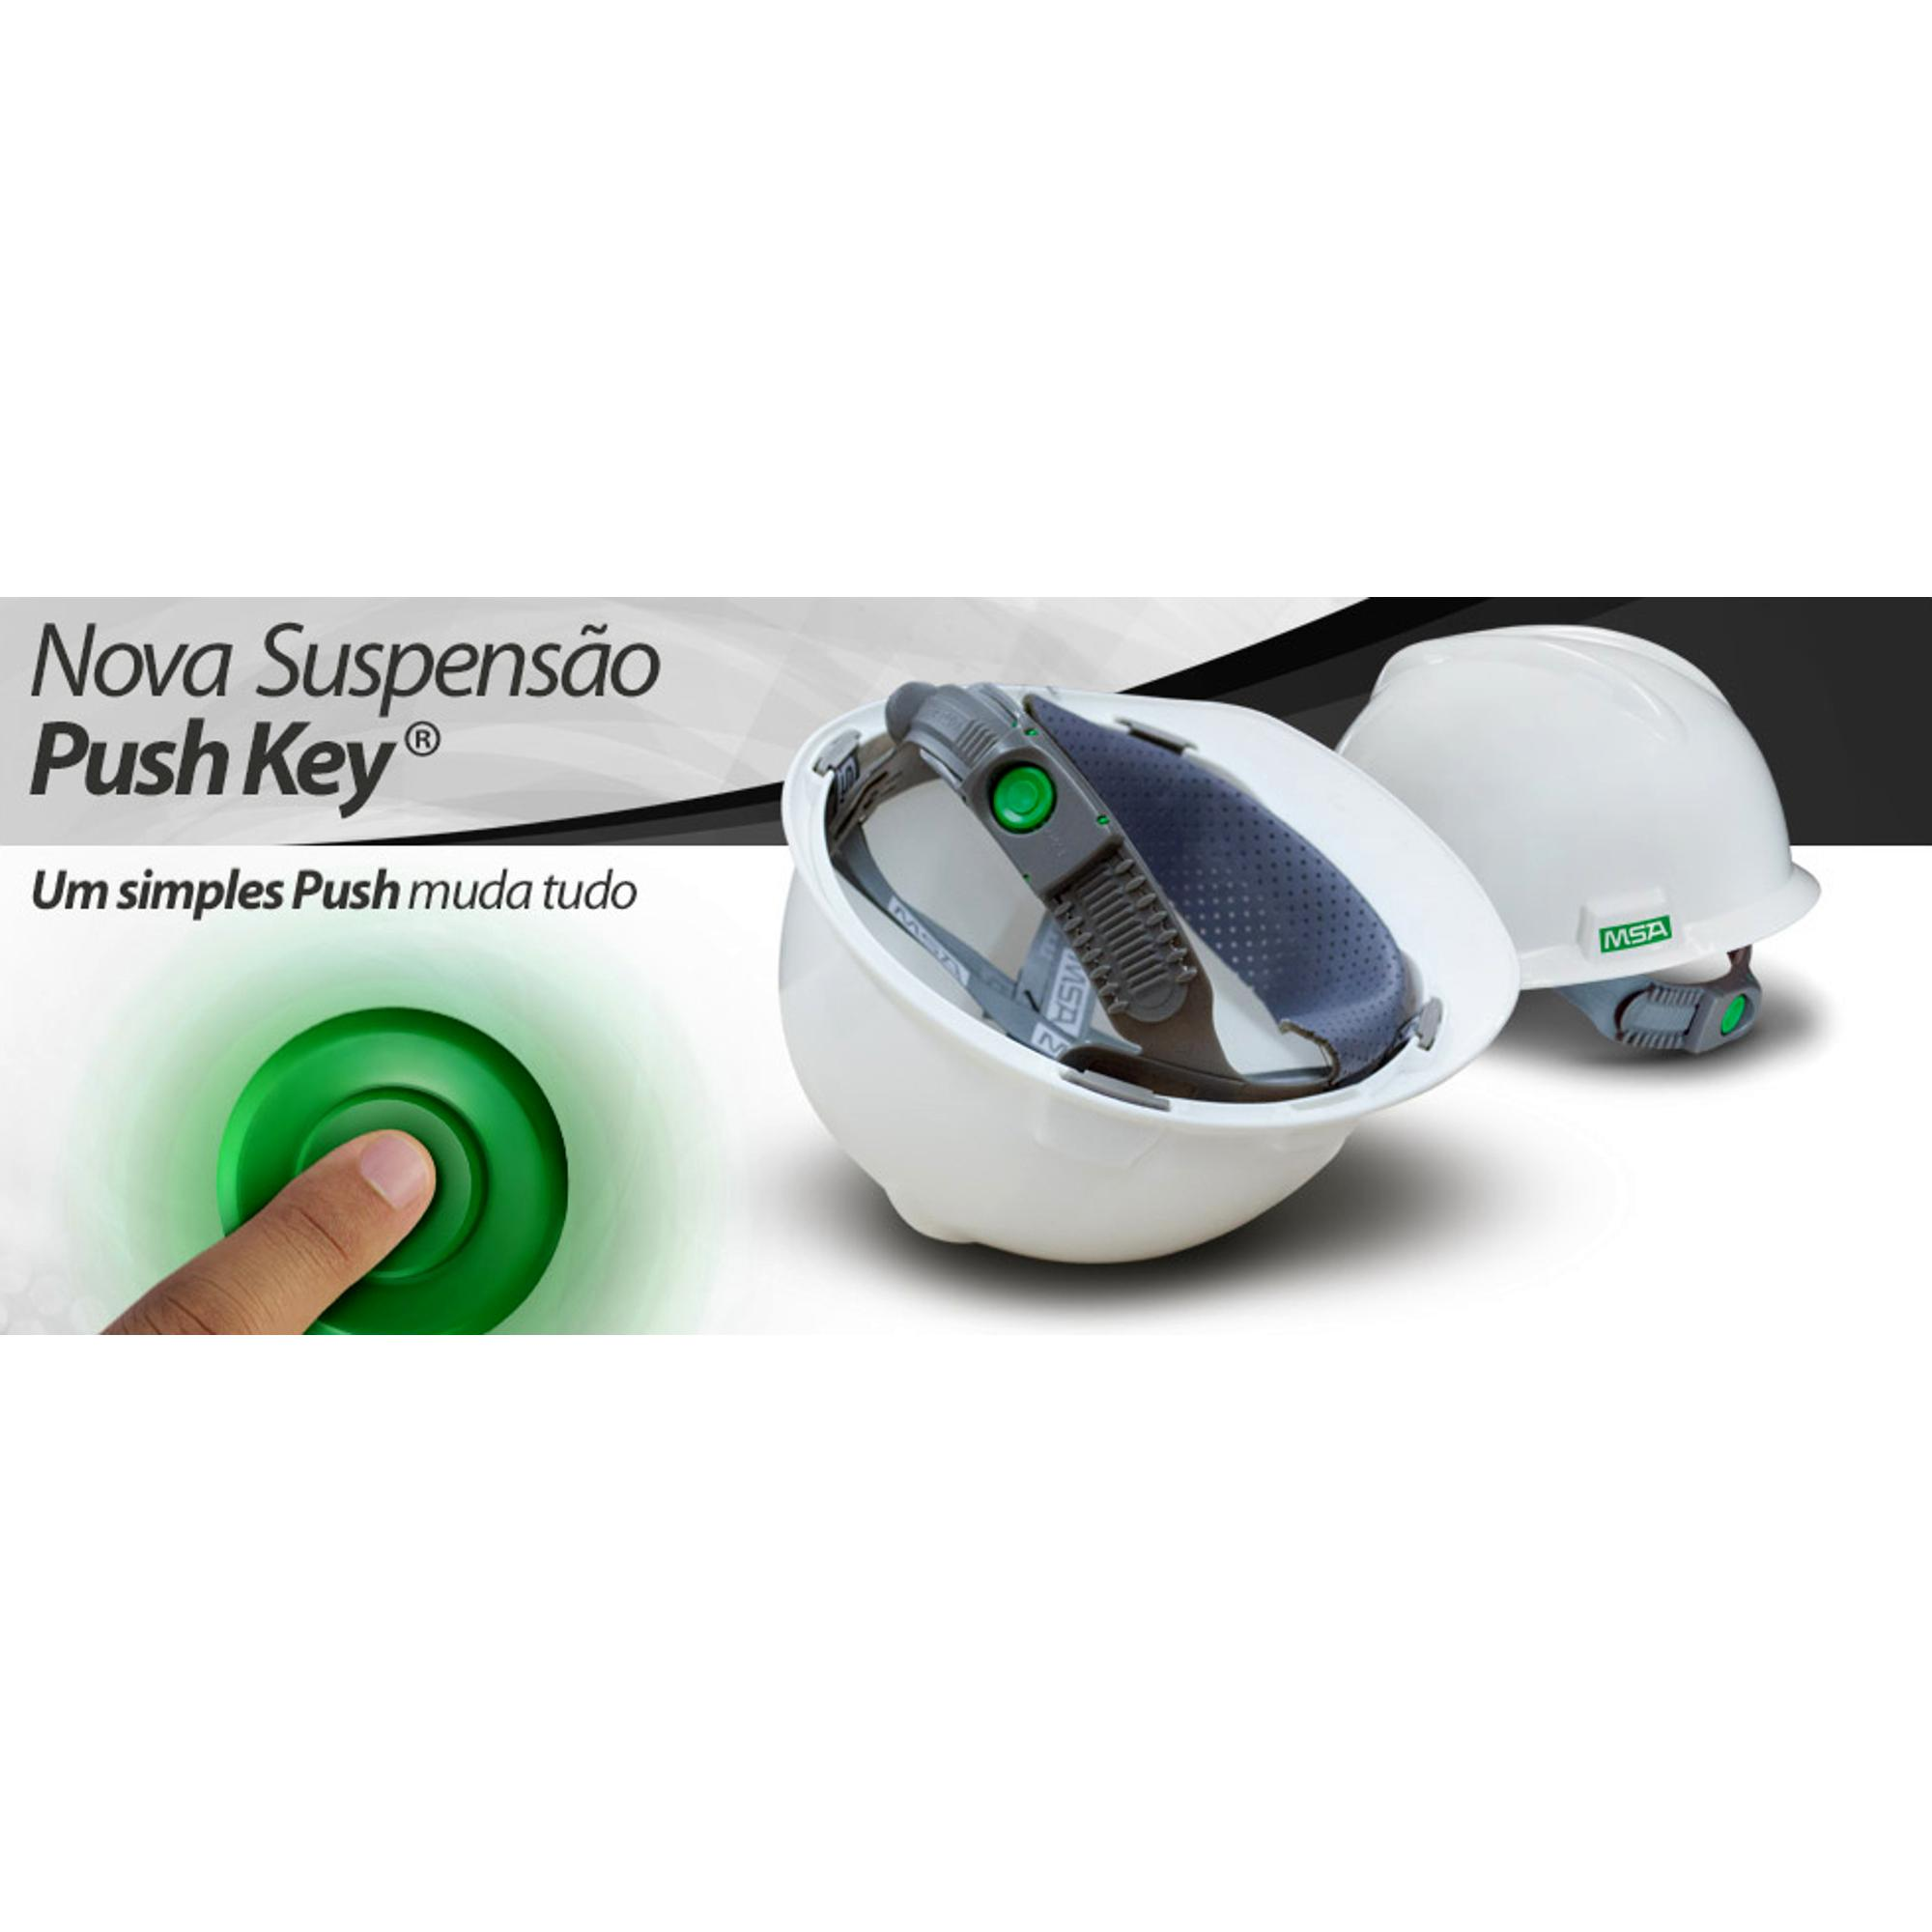 CAPACETE V-GARD  - PUSH KEY E JUGULAR - MSA  CA:498 BRANCO  - DE PAULA EPI